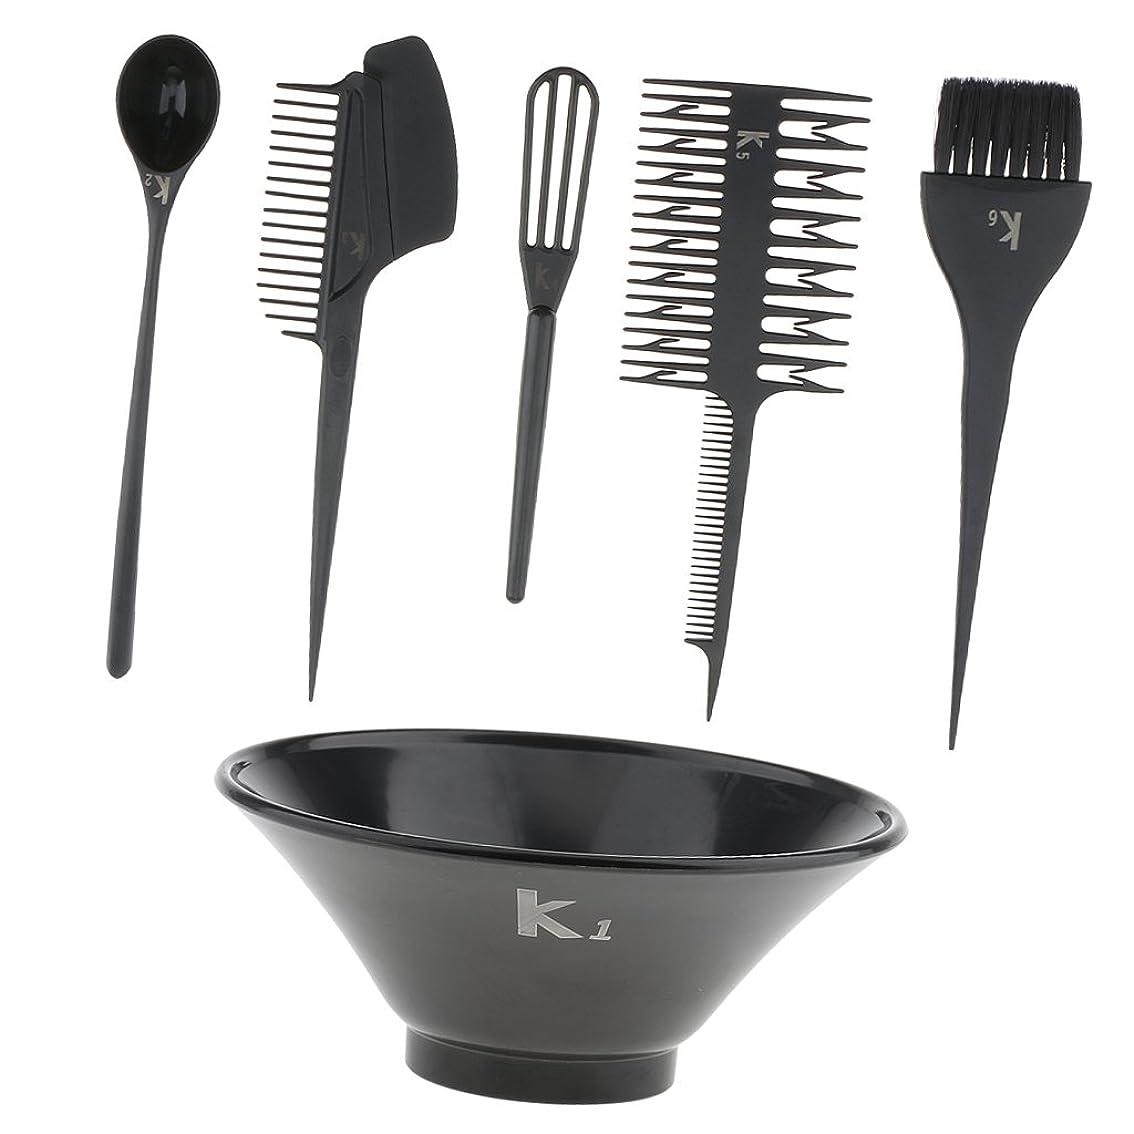 CUTICATE 6個 DIY 髪用具キット サロン用具 髪着色 ブラシ 櫛 二頭櫛 ミキシングボウル スプーン 全2色 - ブラック